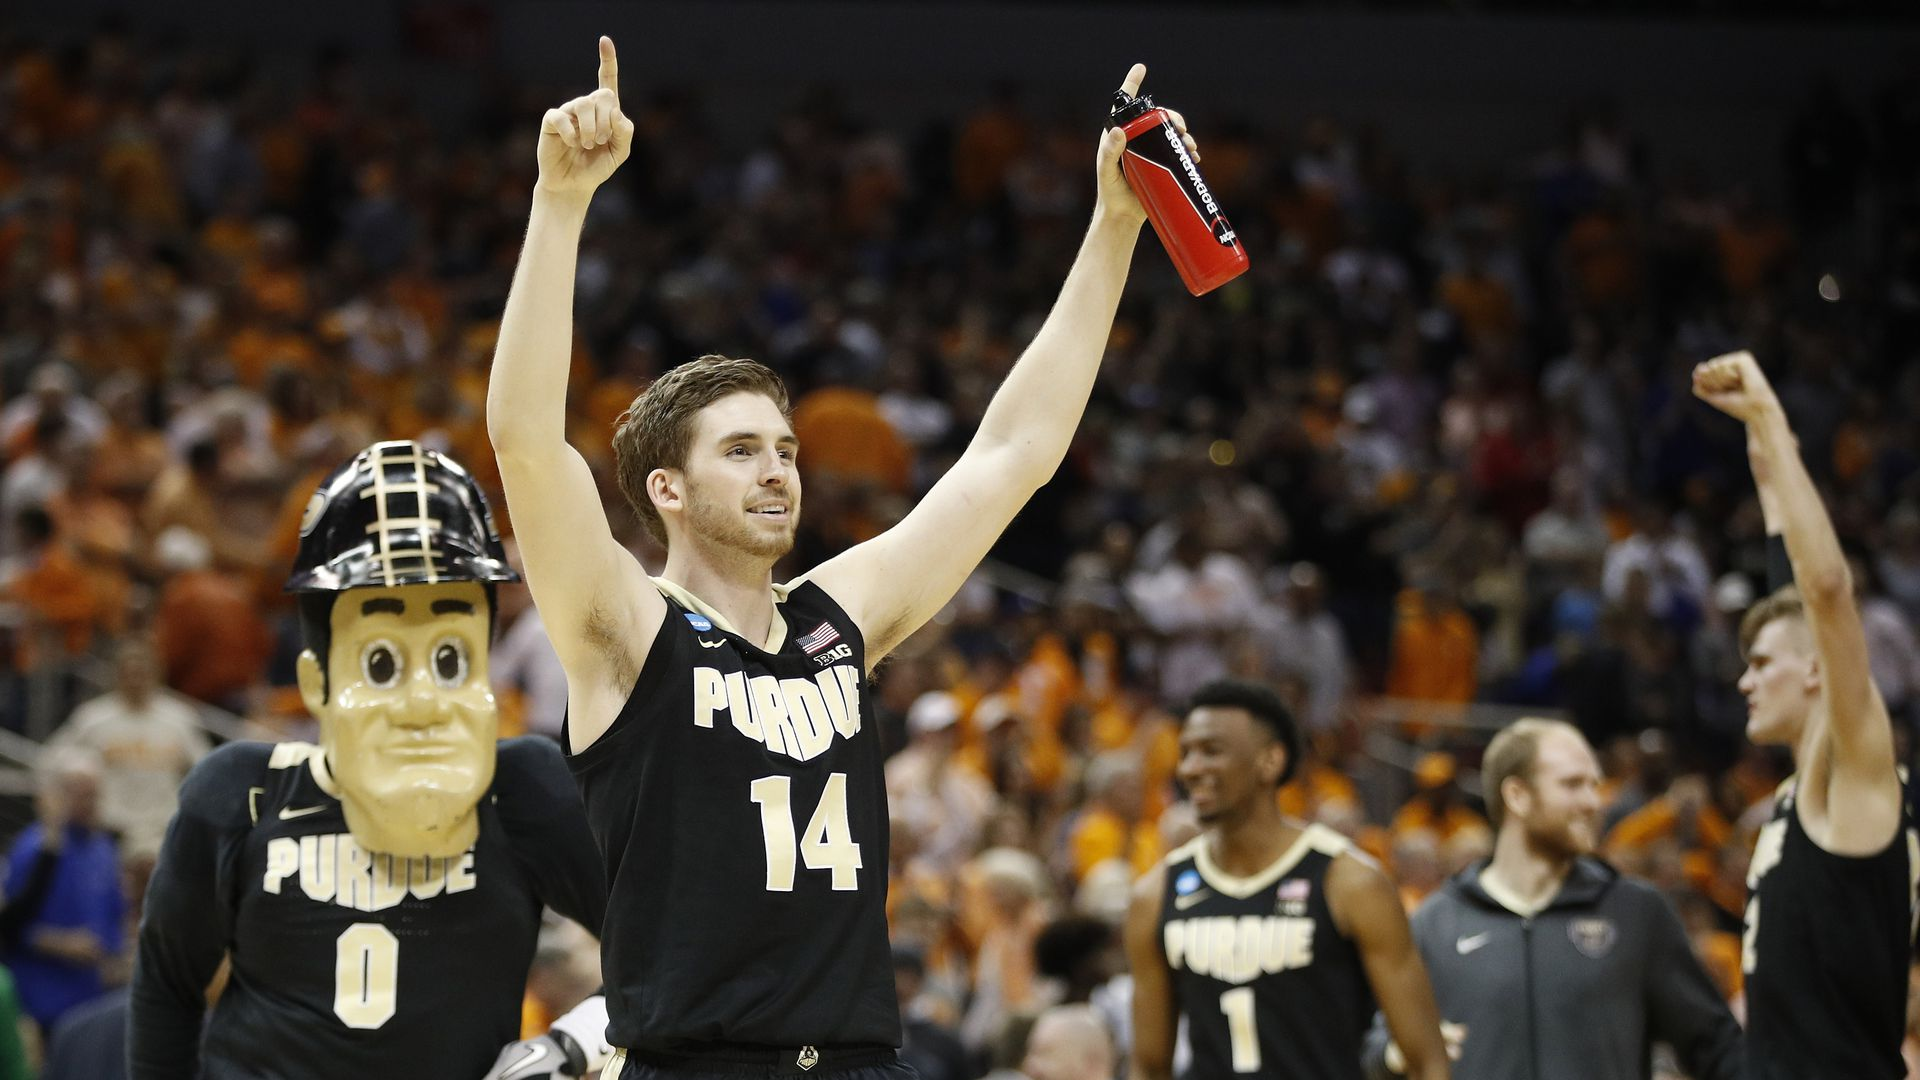 Purdue's Ryan Cline celebrates the win